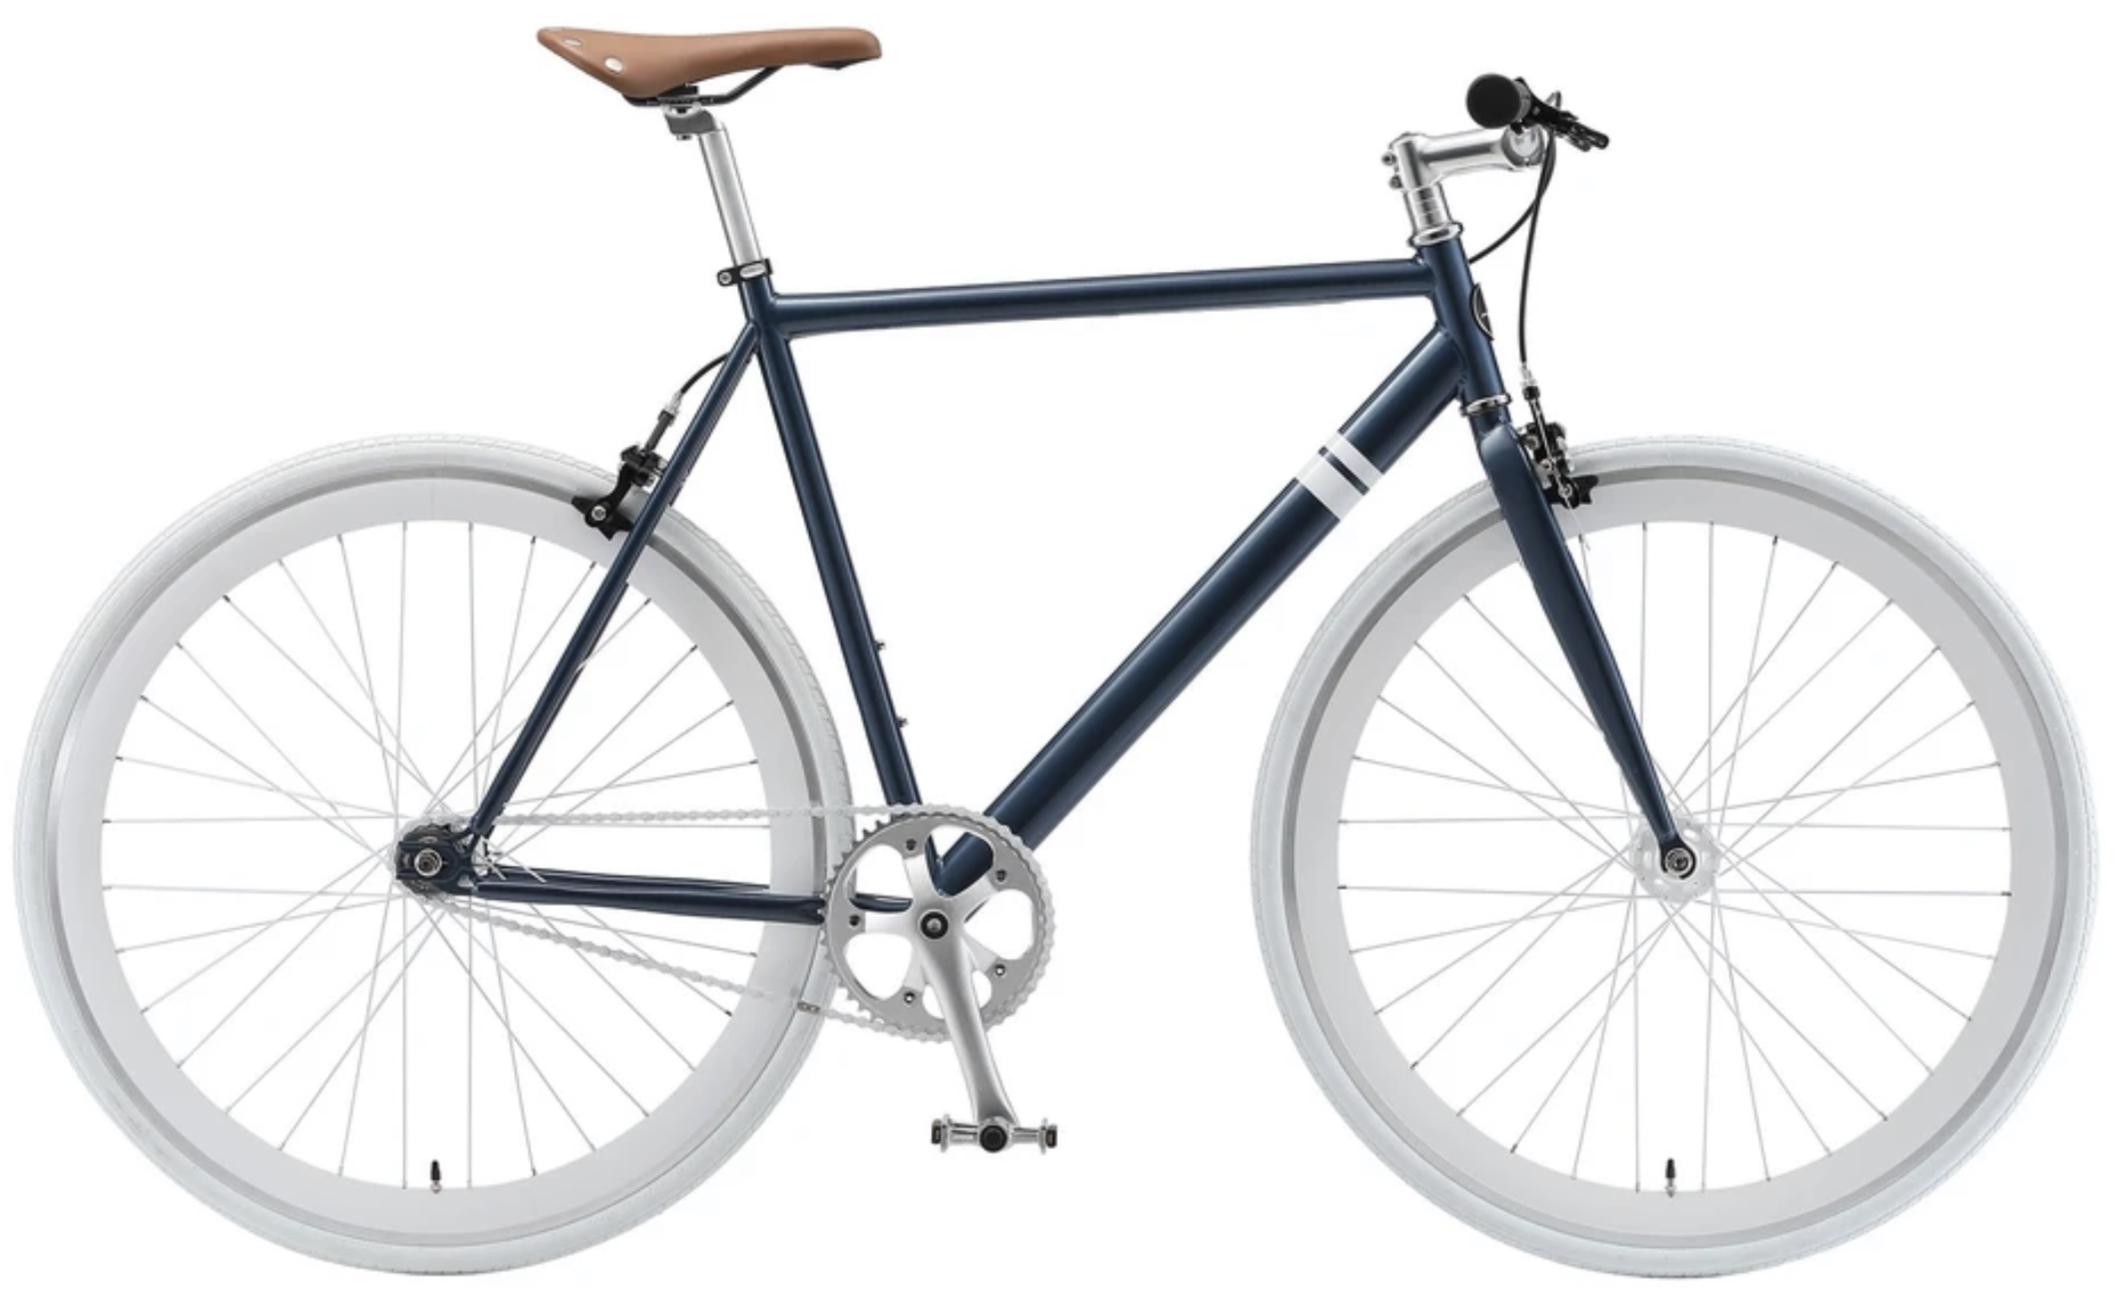 Solé Bicycles Whaler II